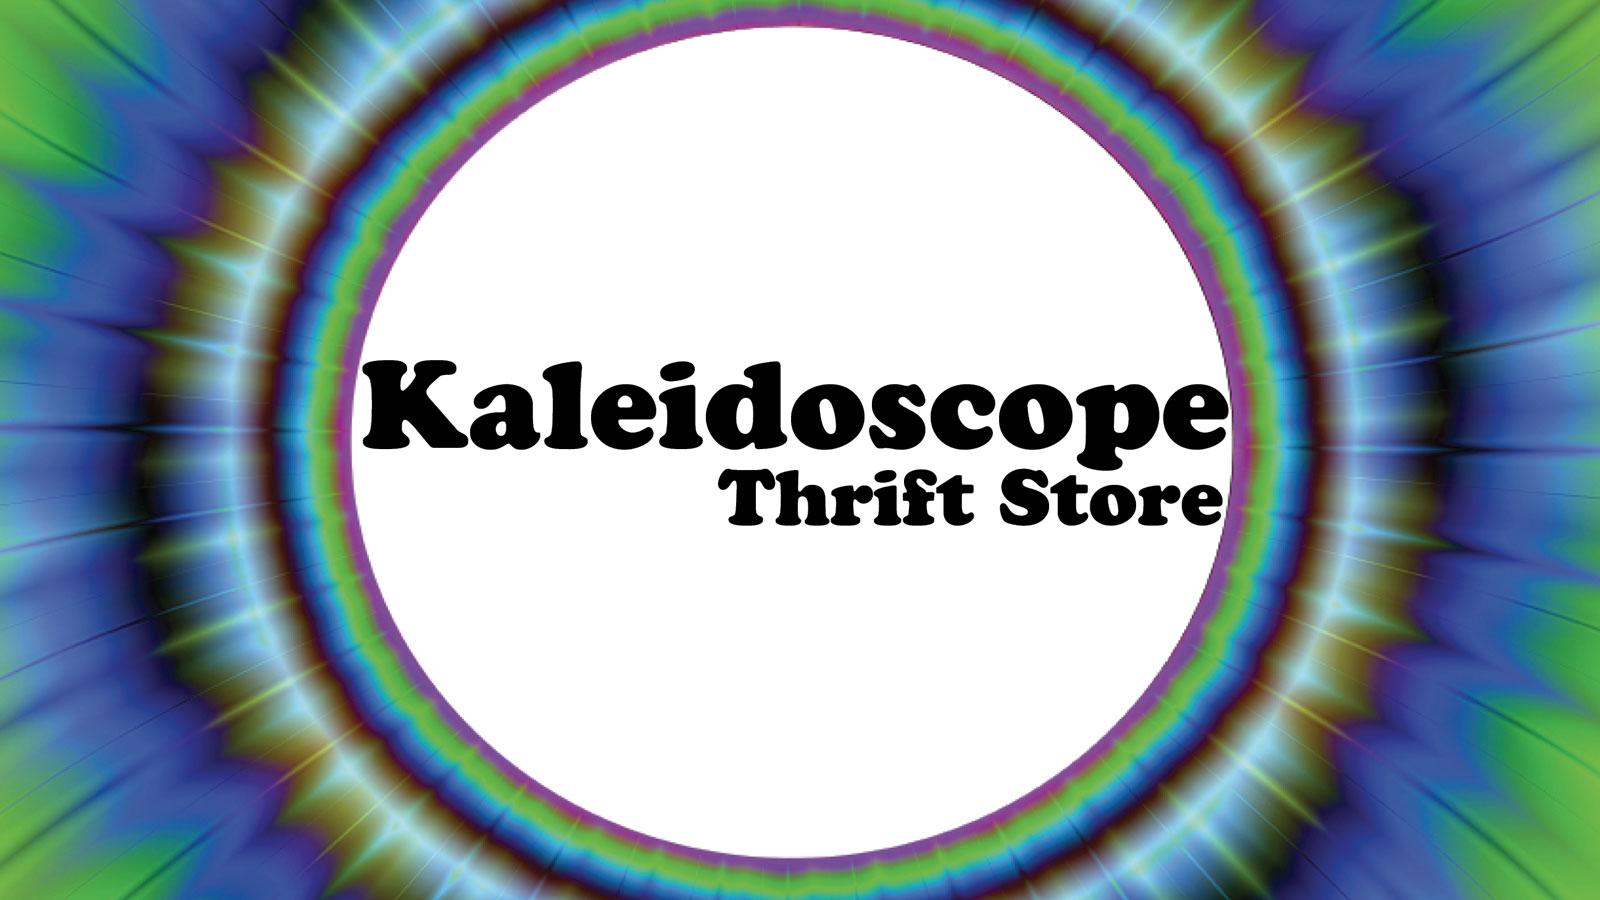 Kaleidoscope thrift store logo